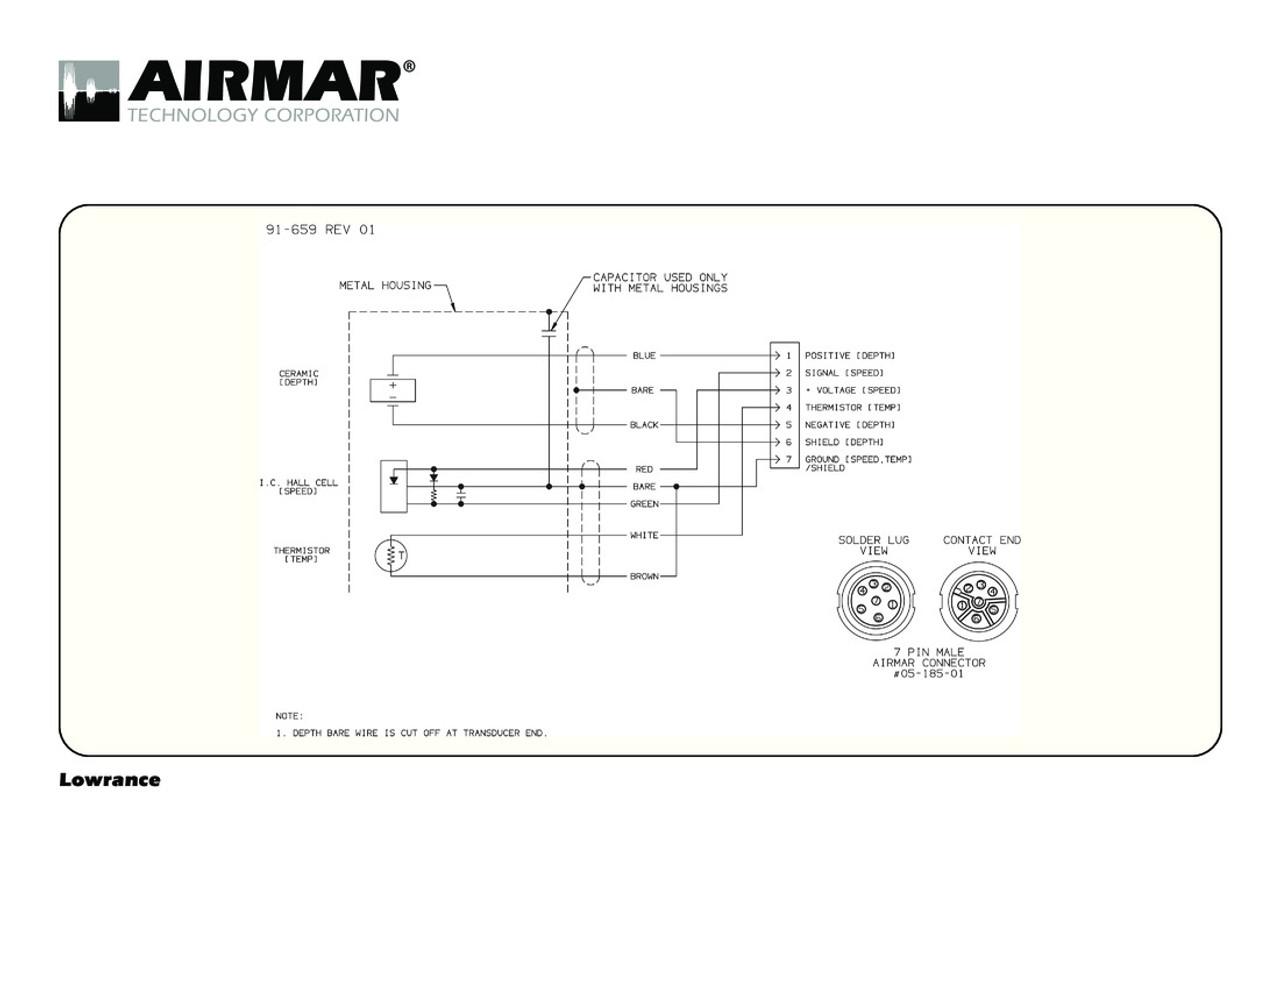 medium resolution of airmar wiring diagram lowrance 7 pin d s t blue bottle marinedepth